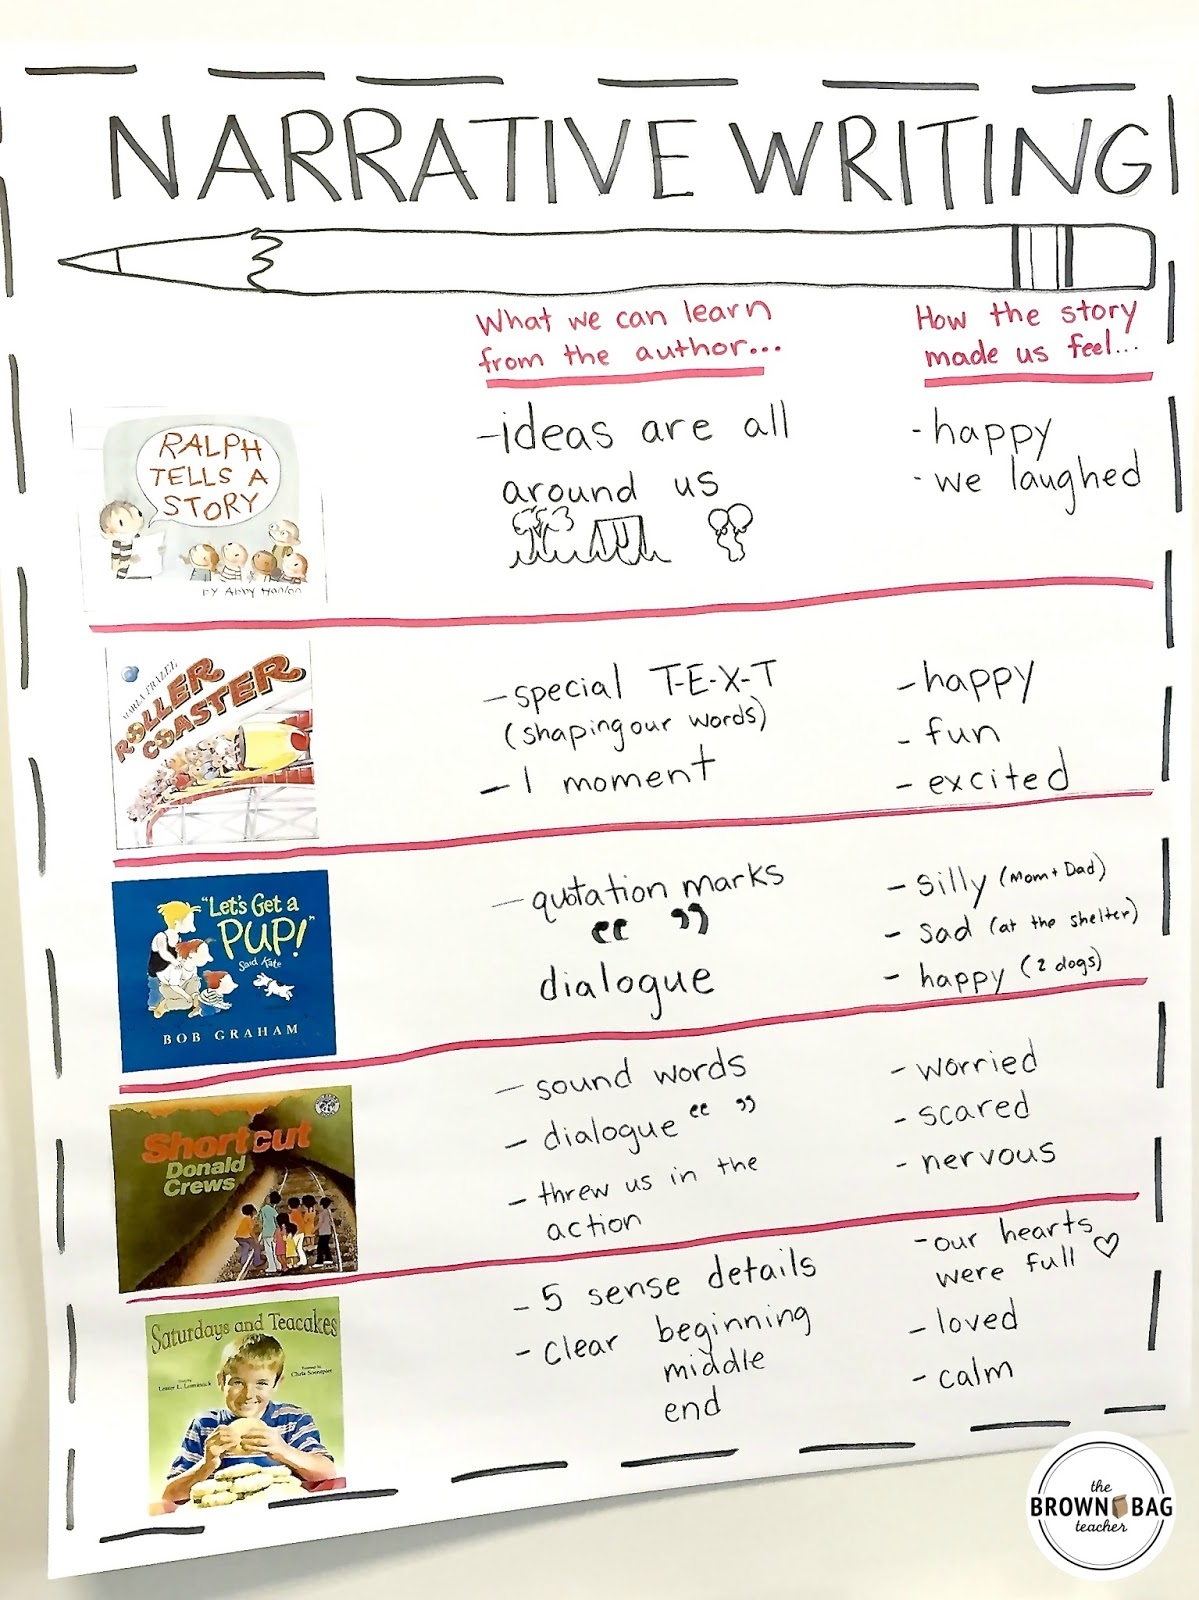 Narrative Writing Mentor Texts - The Brown Bag Teacher